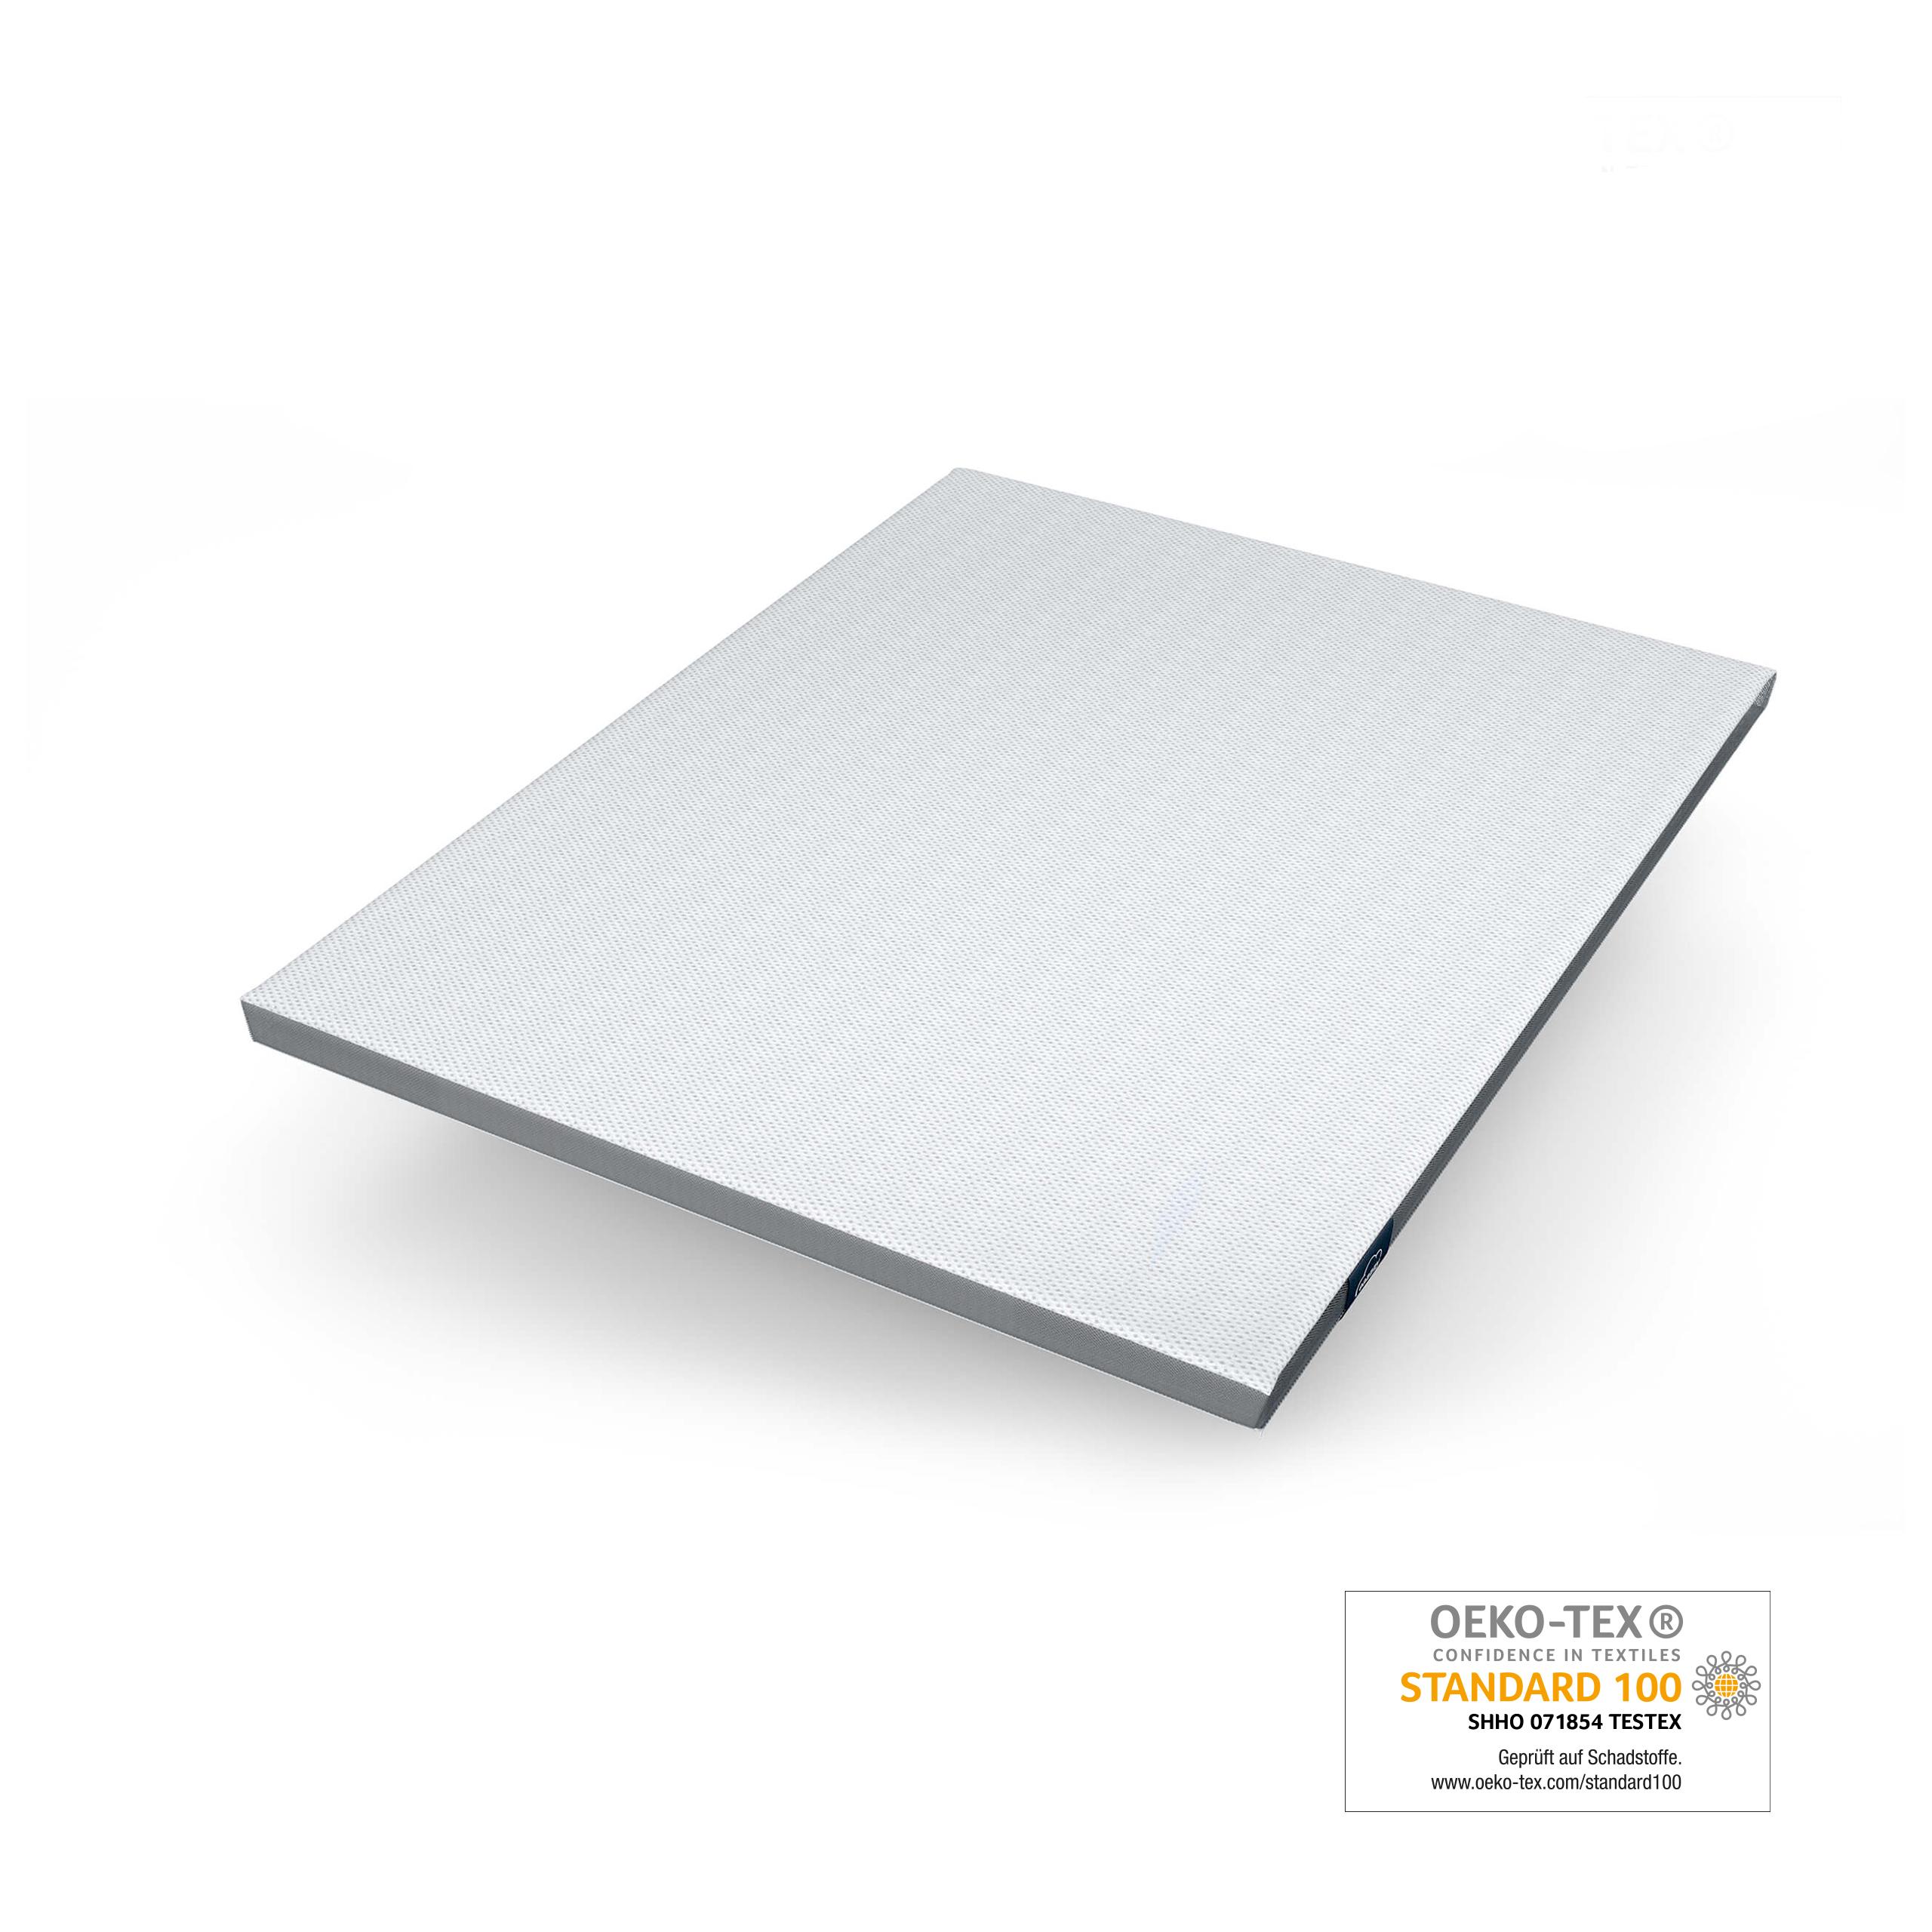 Genius eazzzy | Matratzentopper 160 x 200 x 7 cm A19246